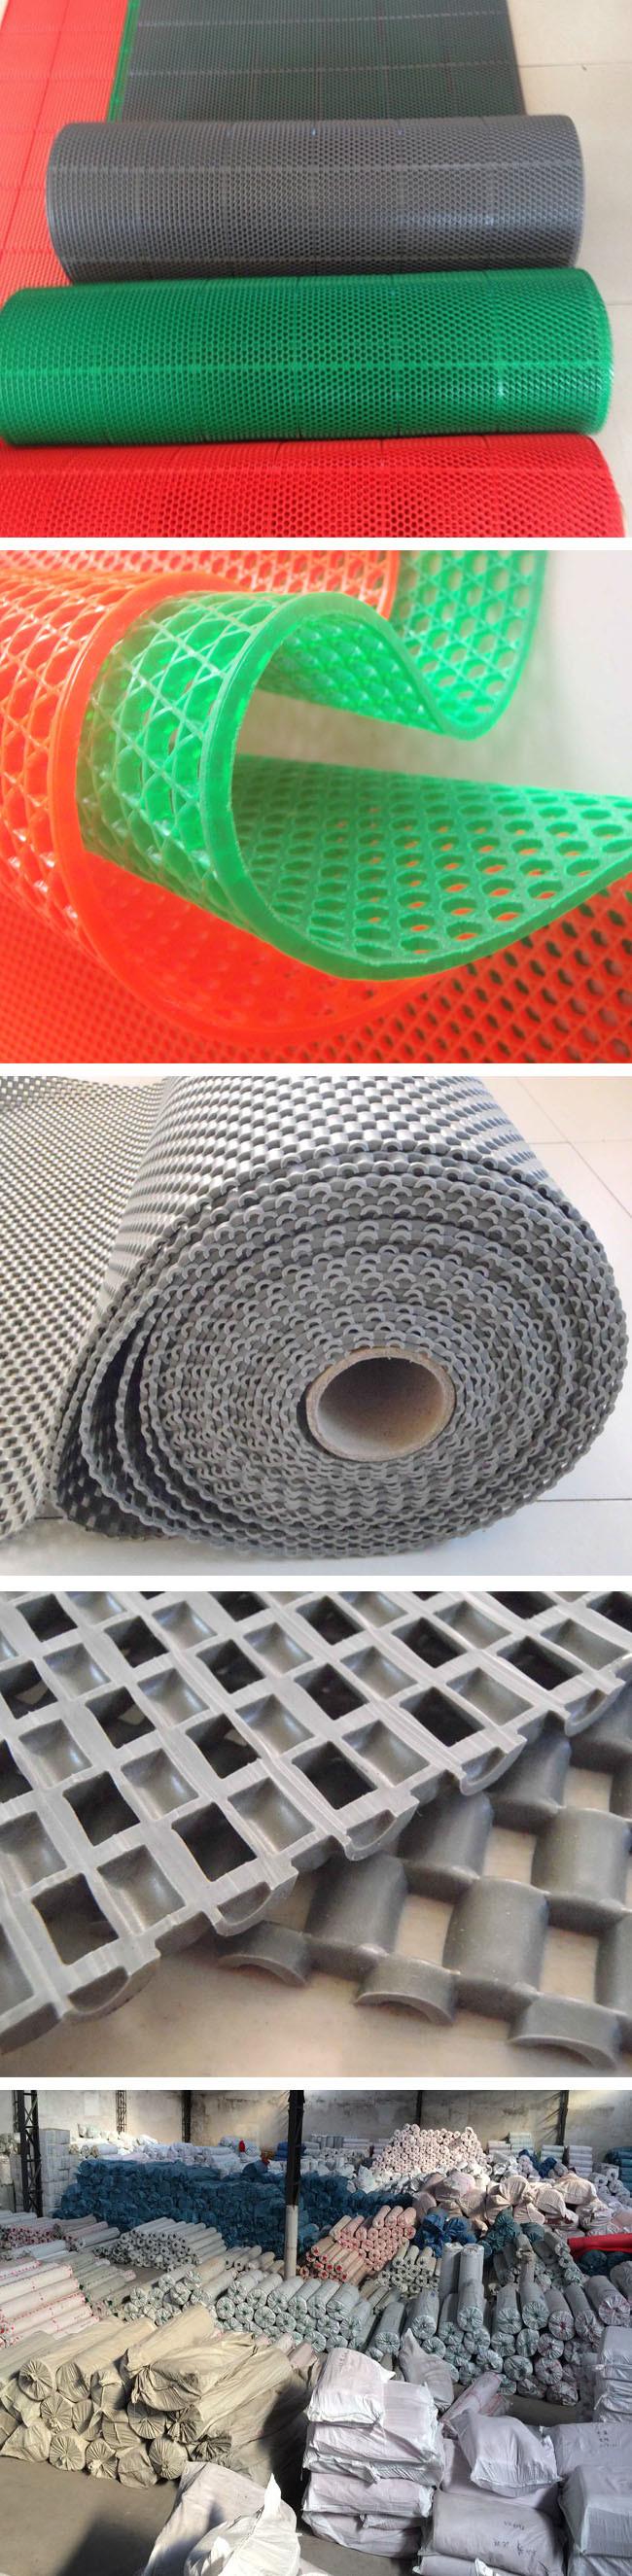 china wet area anti slip non skid plastic vinyl pvc door floor  flooring mats roll